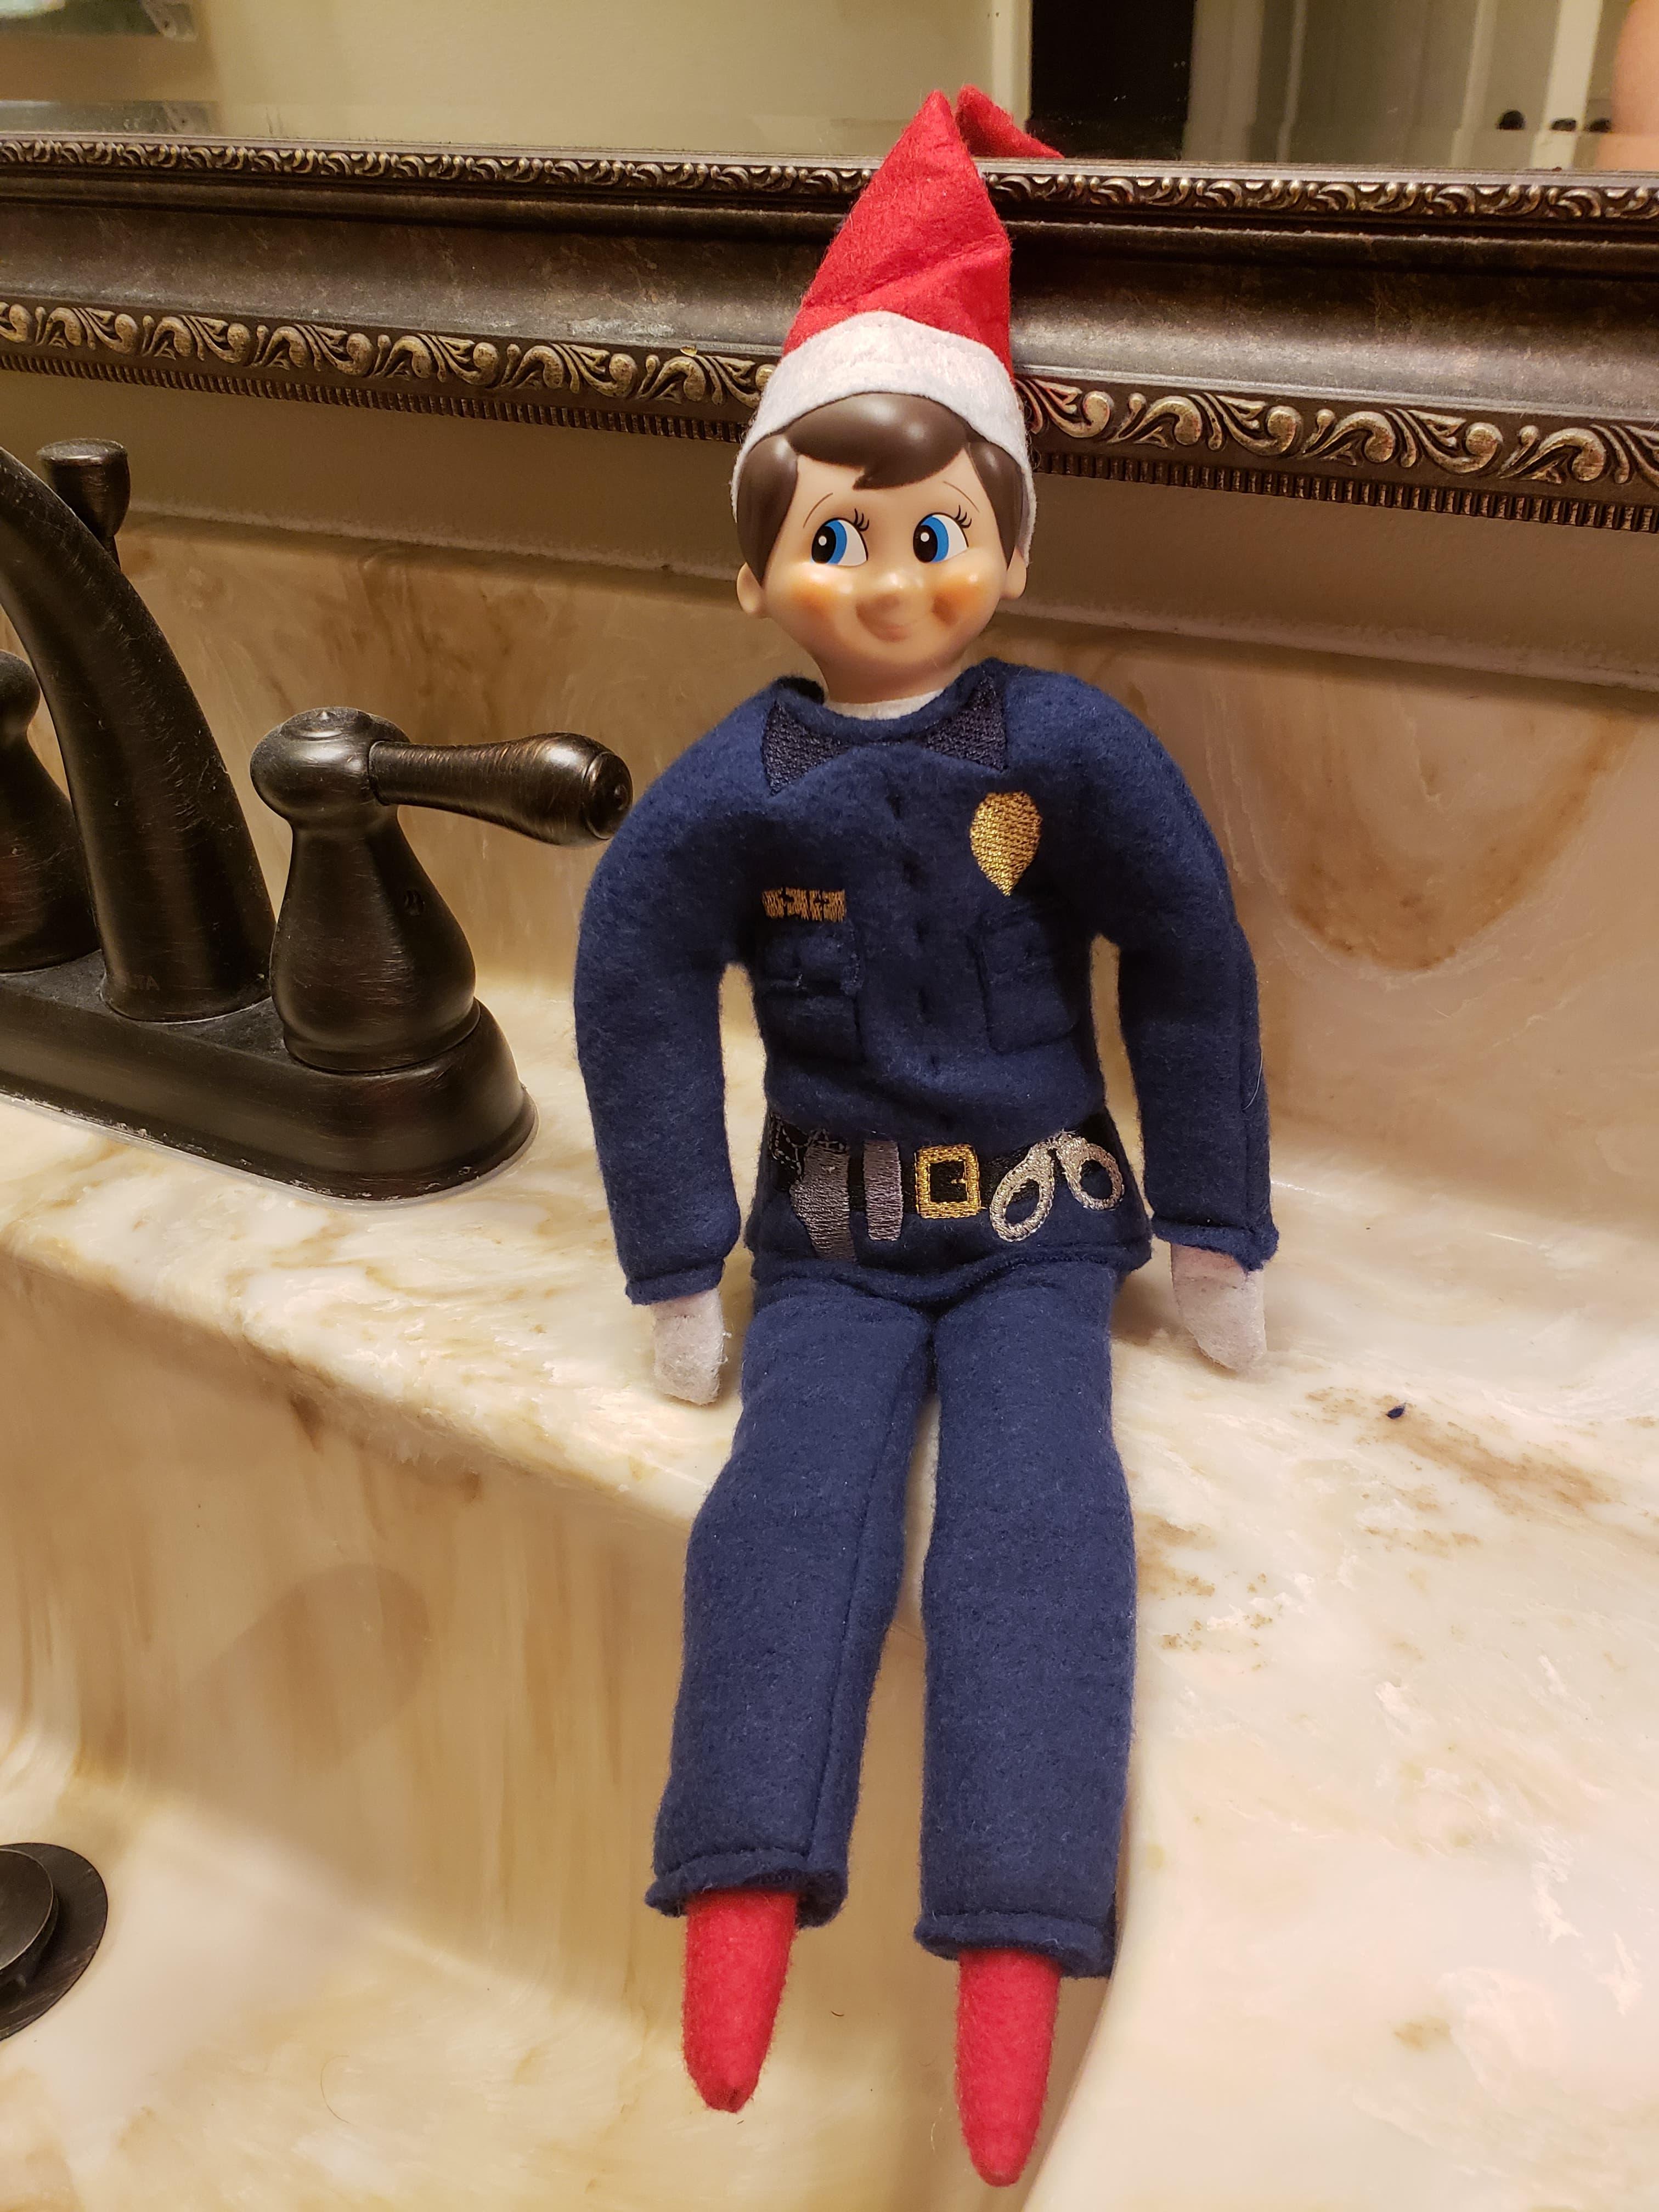 8 Funny Police Elf On The Shelf Ideas 10 Bonus Ideas